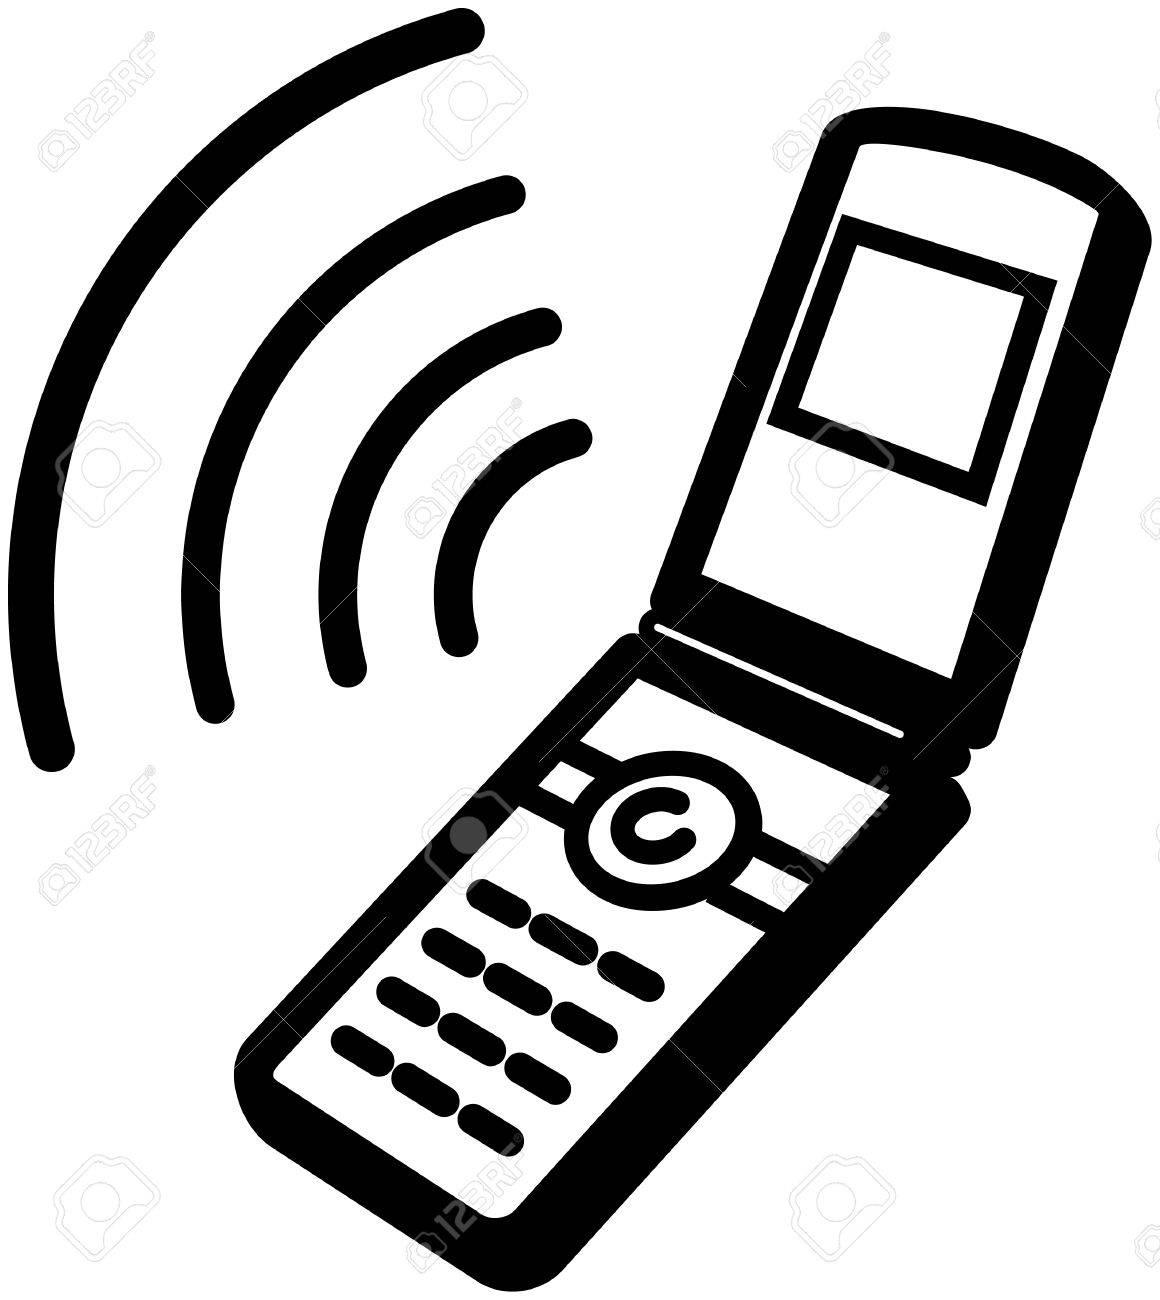 Ringing mobile phone icon.